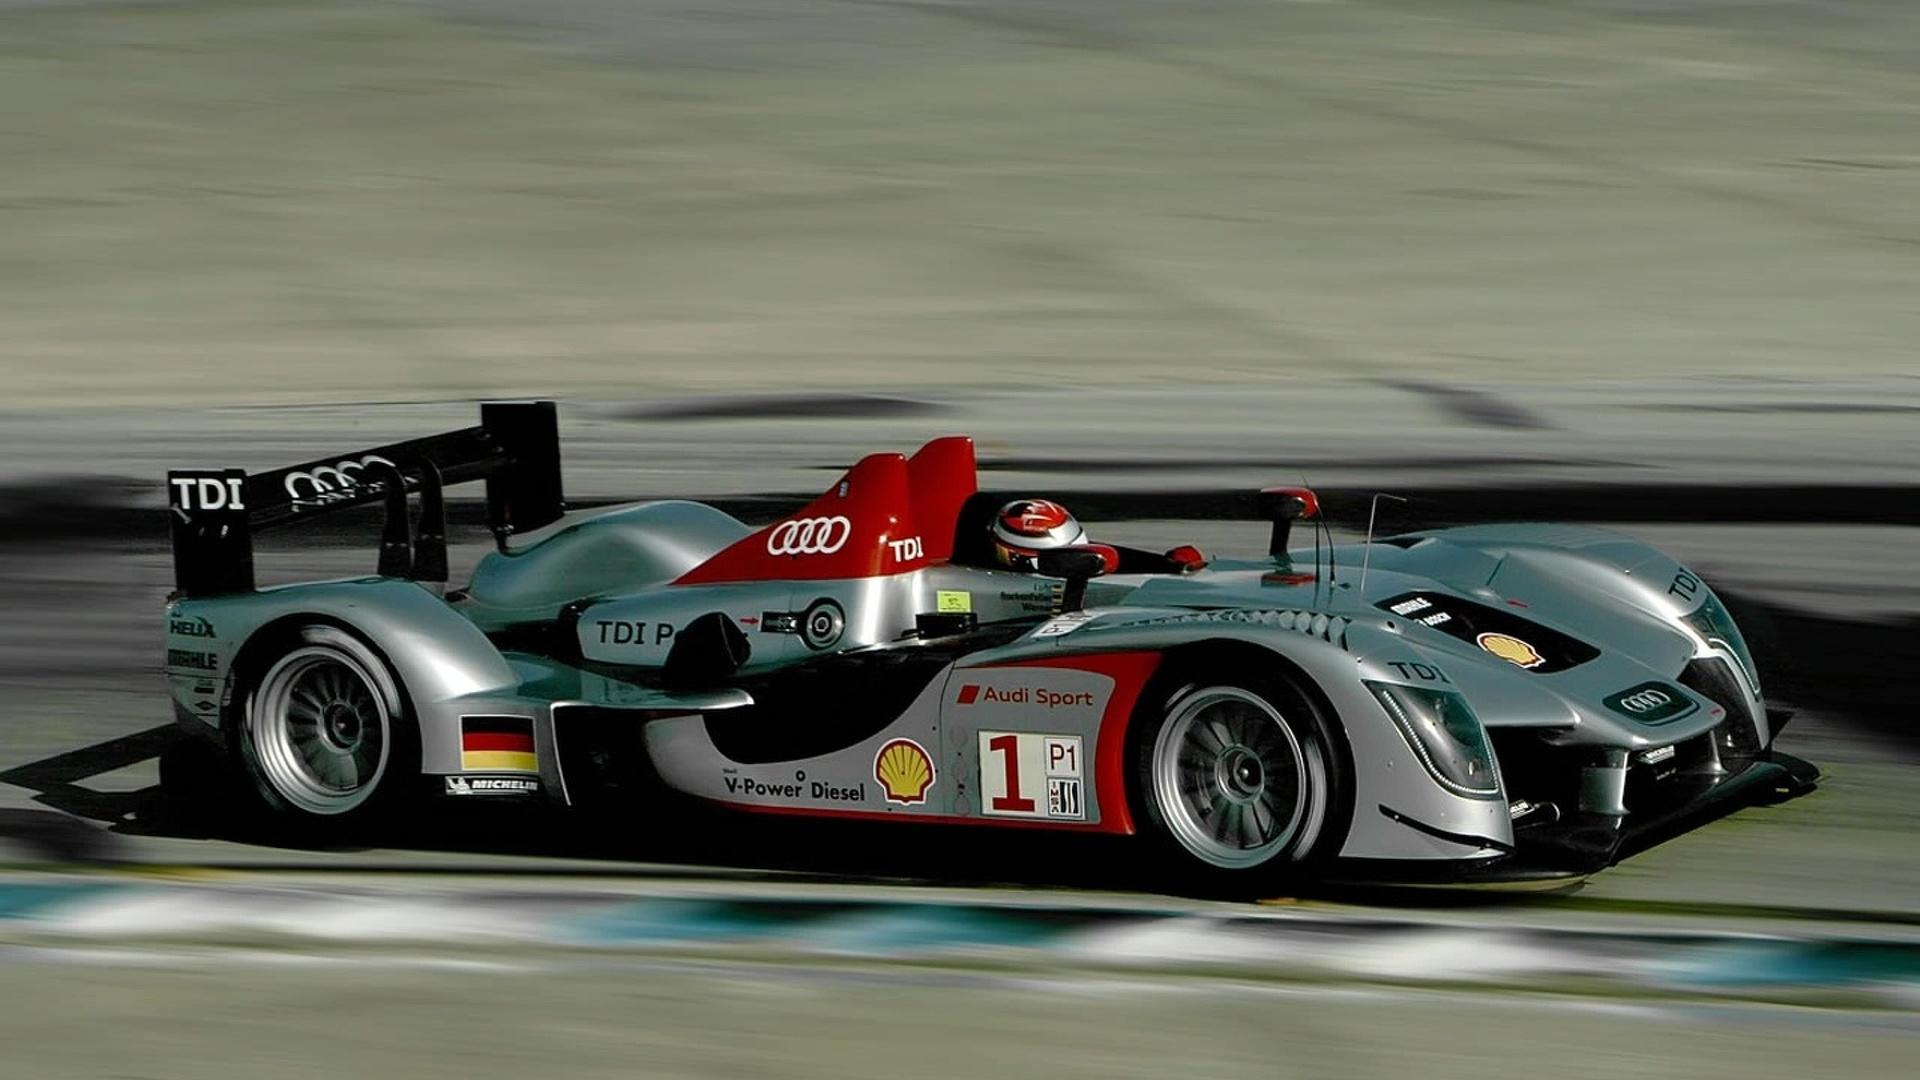 Kelebihan Kekurangan Audi R15 Murah Berkualitas